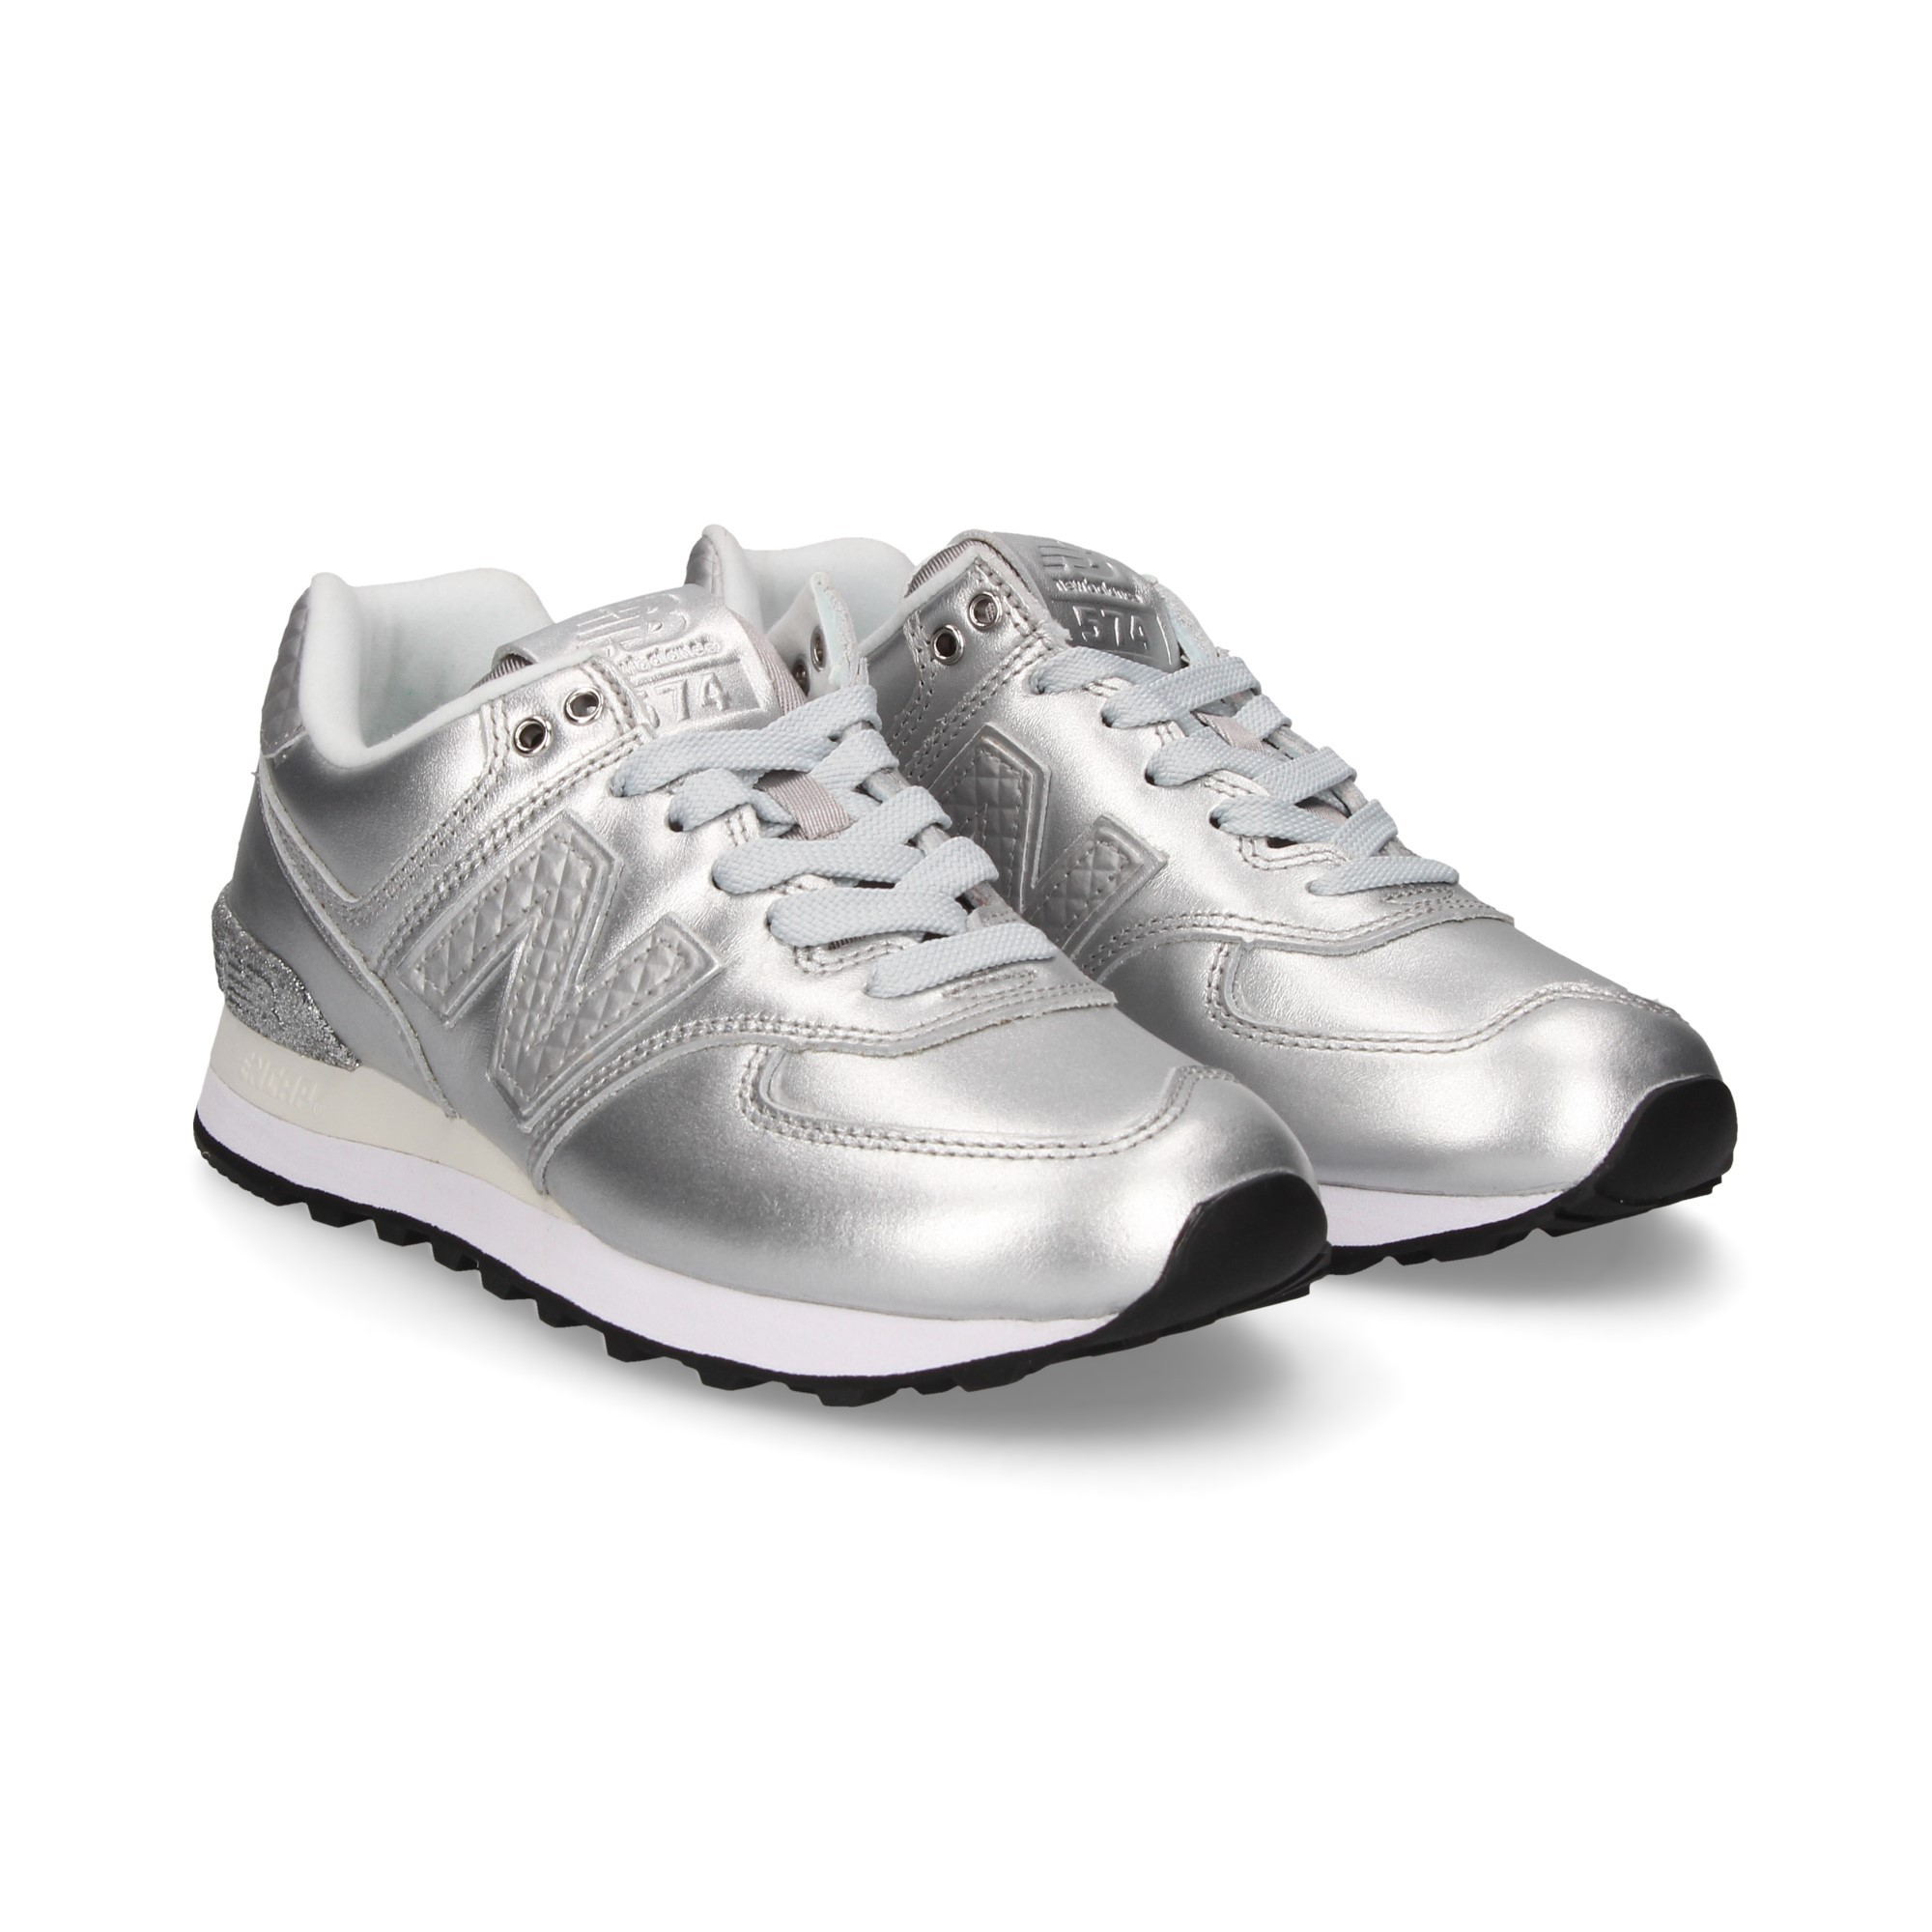 New Balance chaussures voiture